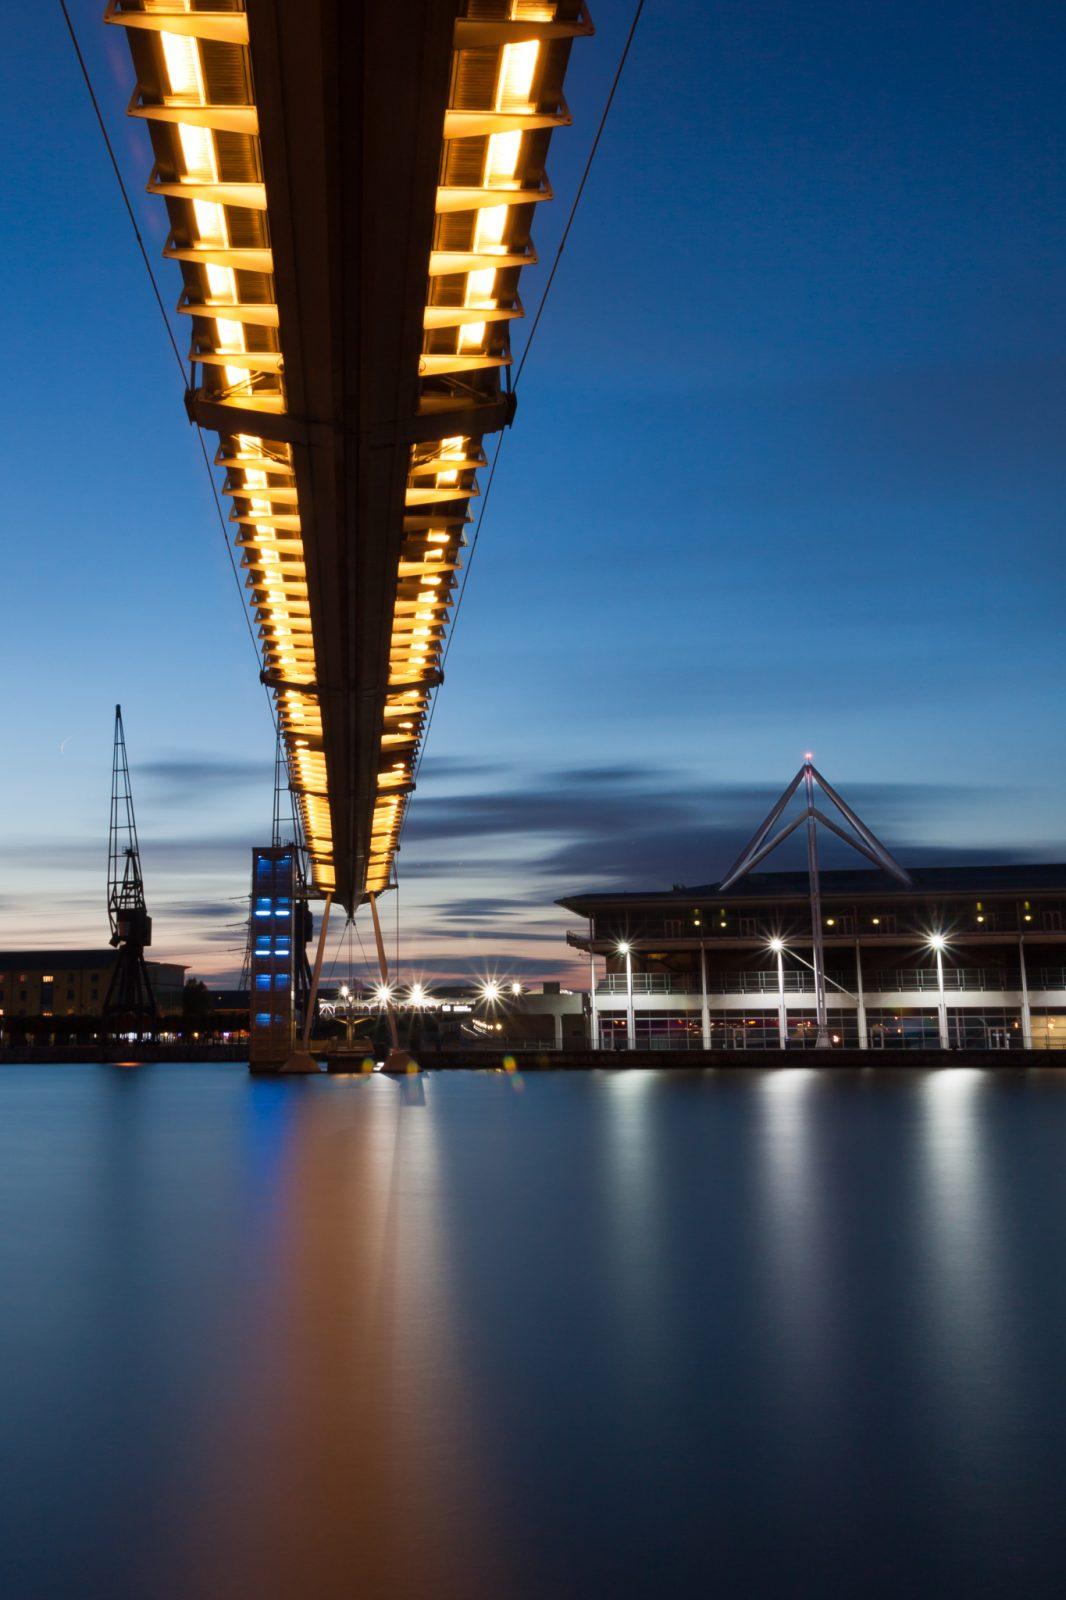 Pedestrian Footbridge, Royal Victoria Dock